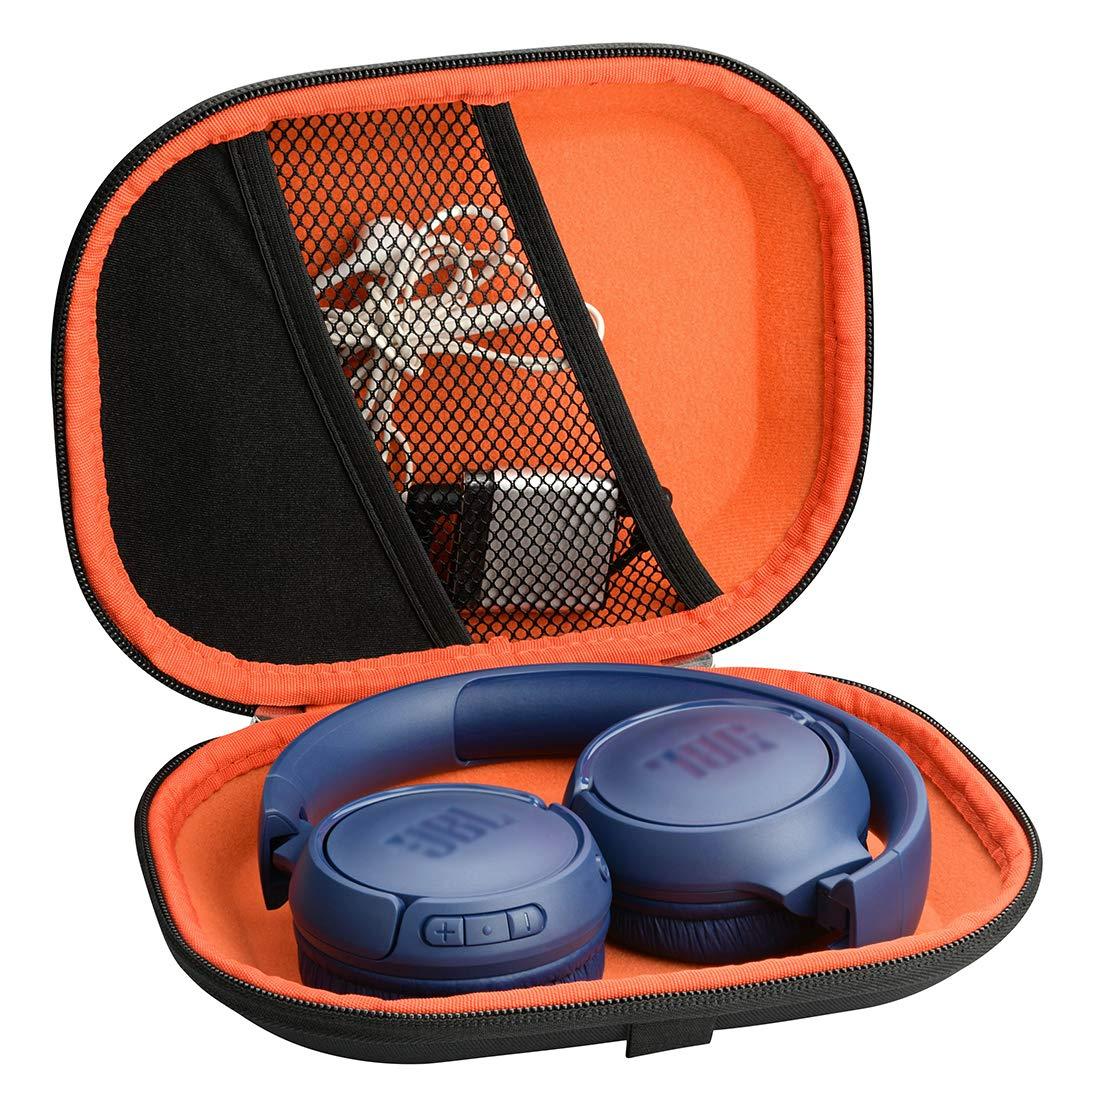 Geekria UltraShell Funda Dura Protectora de Transporte con Espacio para Accesorios Funda para Auriculares JBL T600BTNC cancelaci/ón de Ruido Tune 500BT On-Ear 400BT T450BT E45BT Auriculares